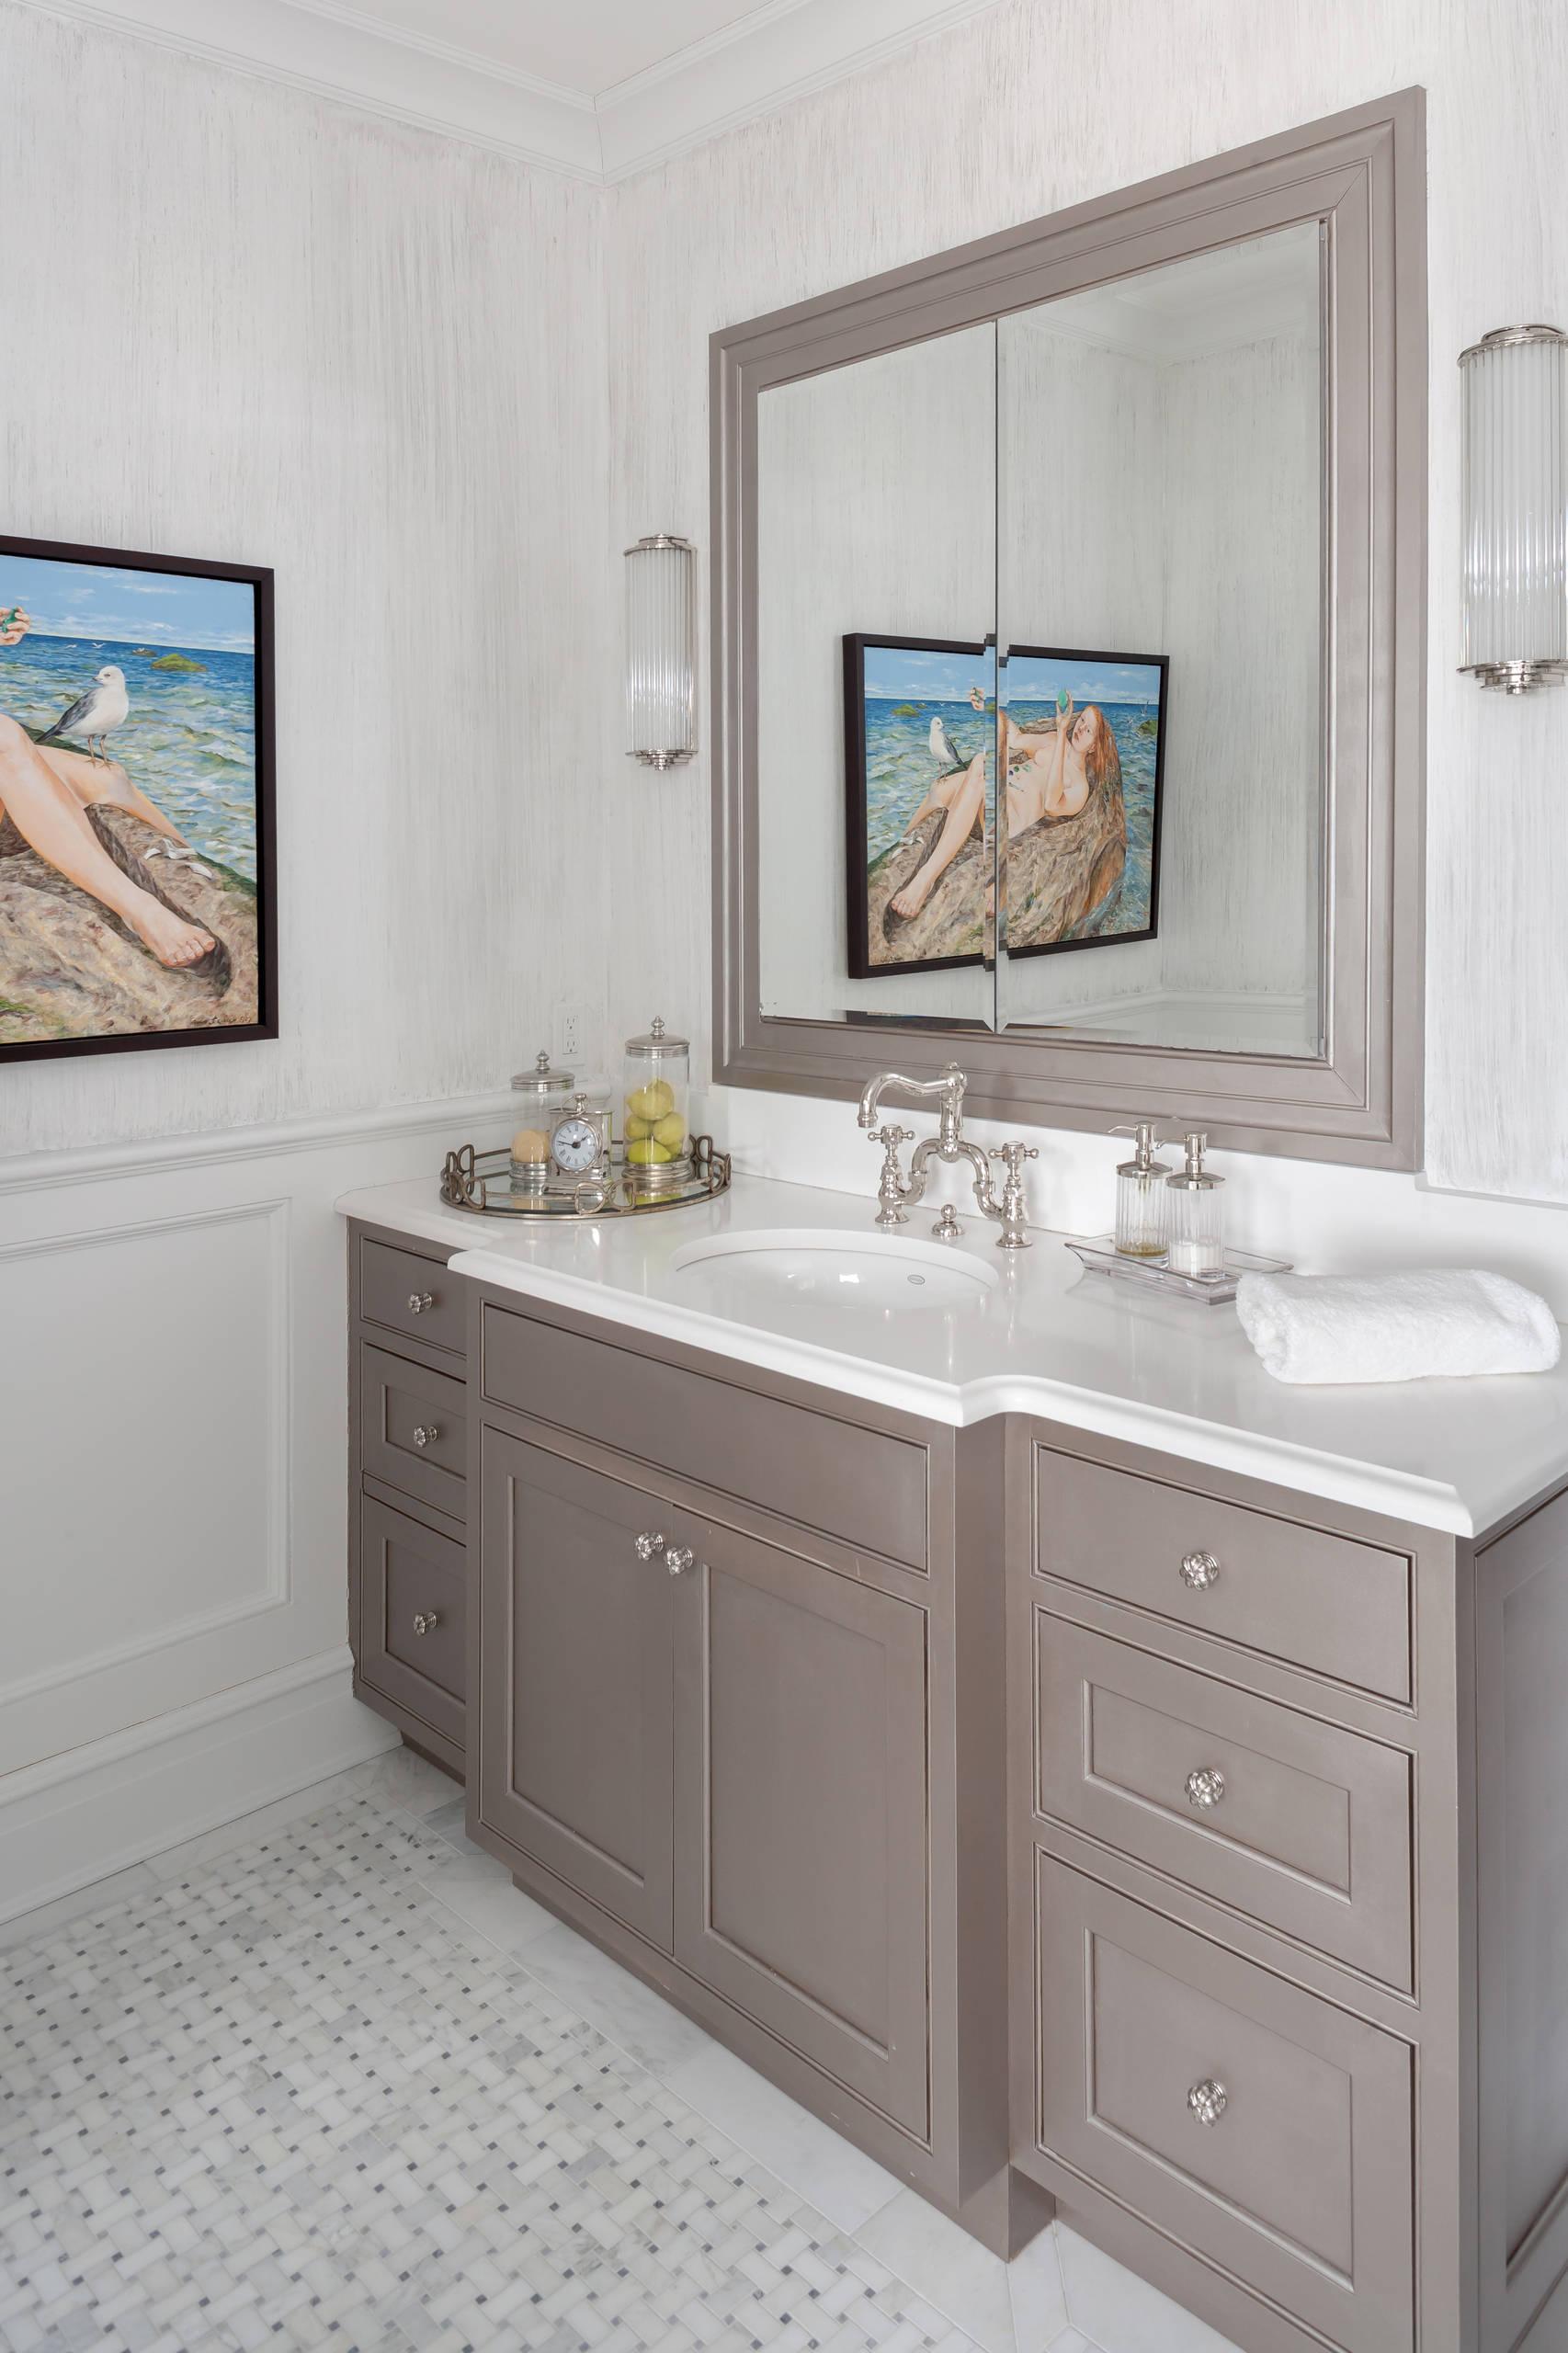 Elegant Beige Taupe And Cream Colored Bathroom Tile: Creating A Stylish Taupe Bathroom Decor